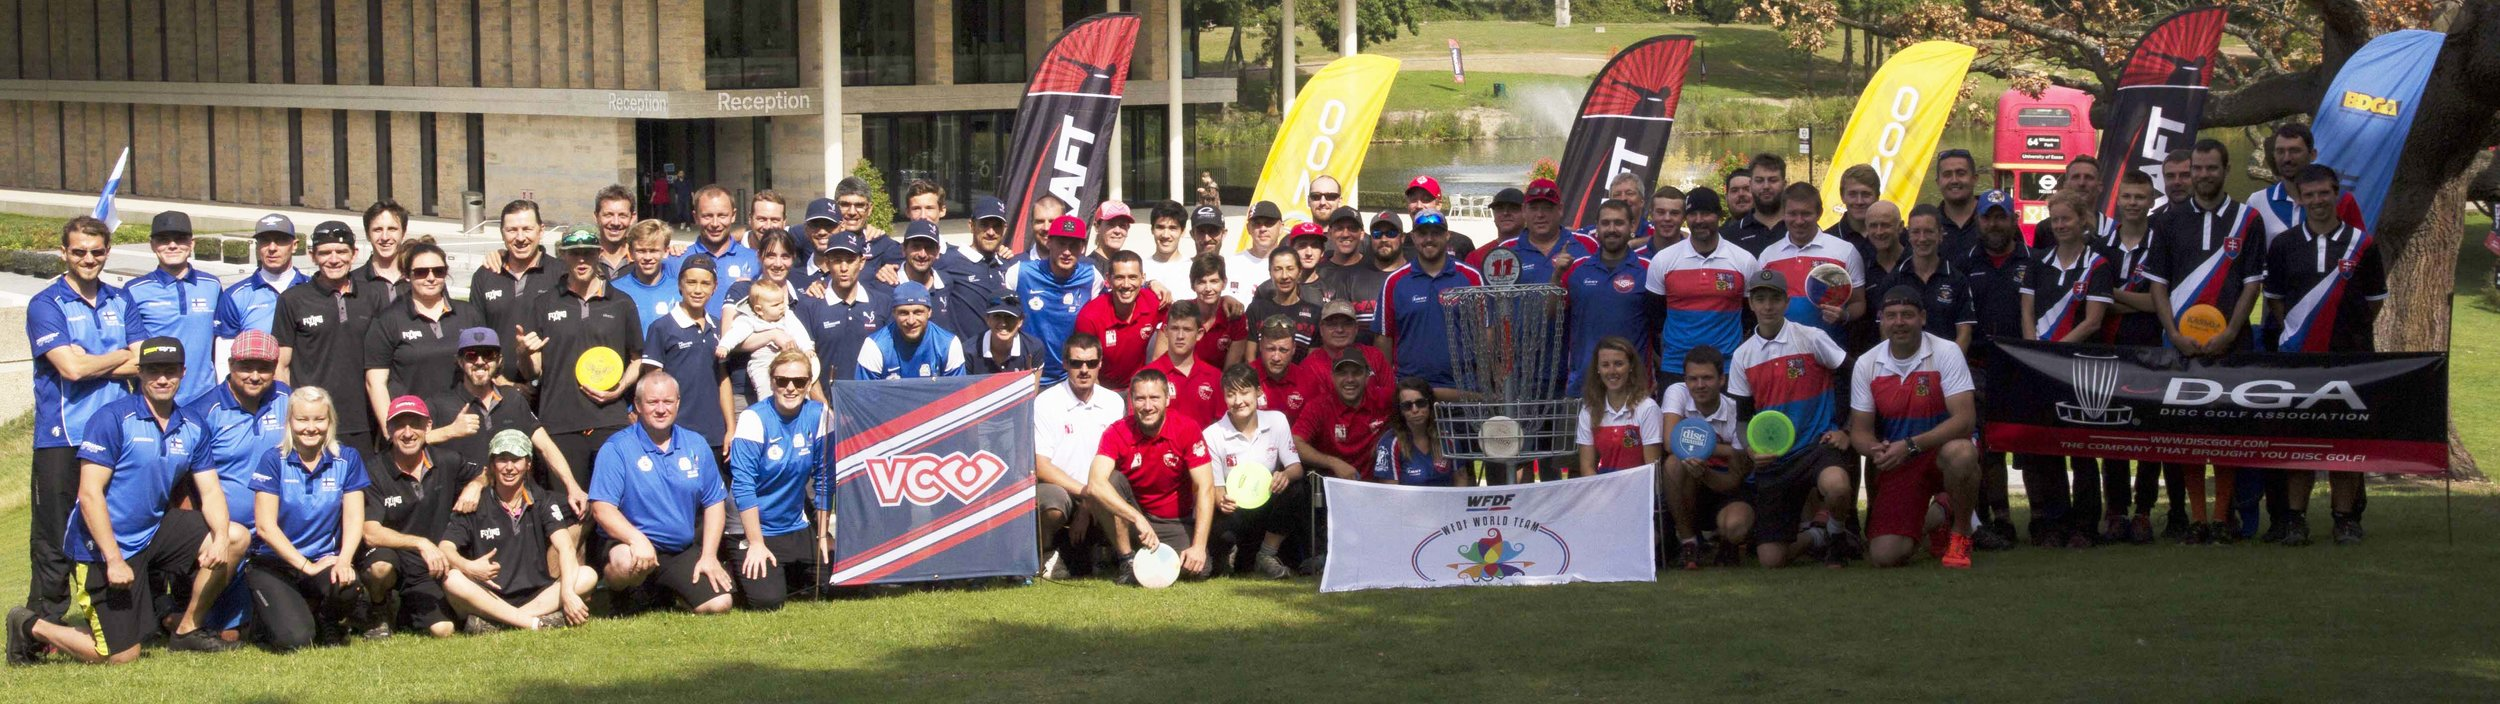 Team World Disc Golf Championship 2017 participants - Colchester, England